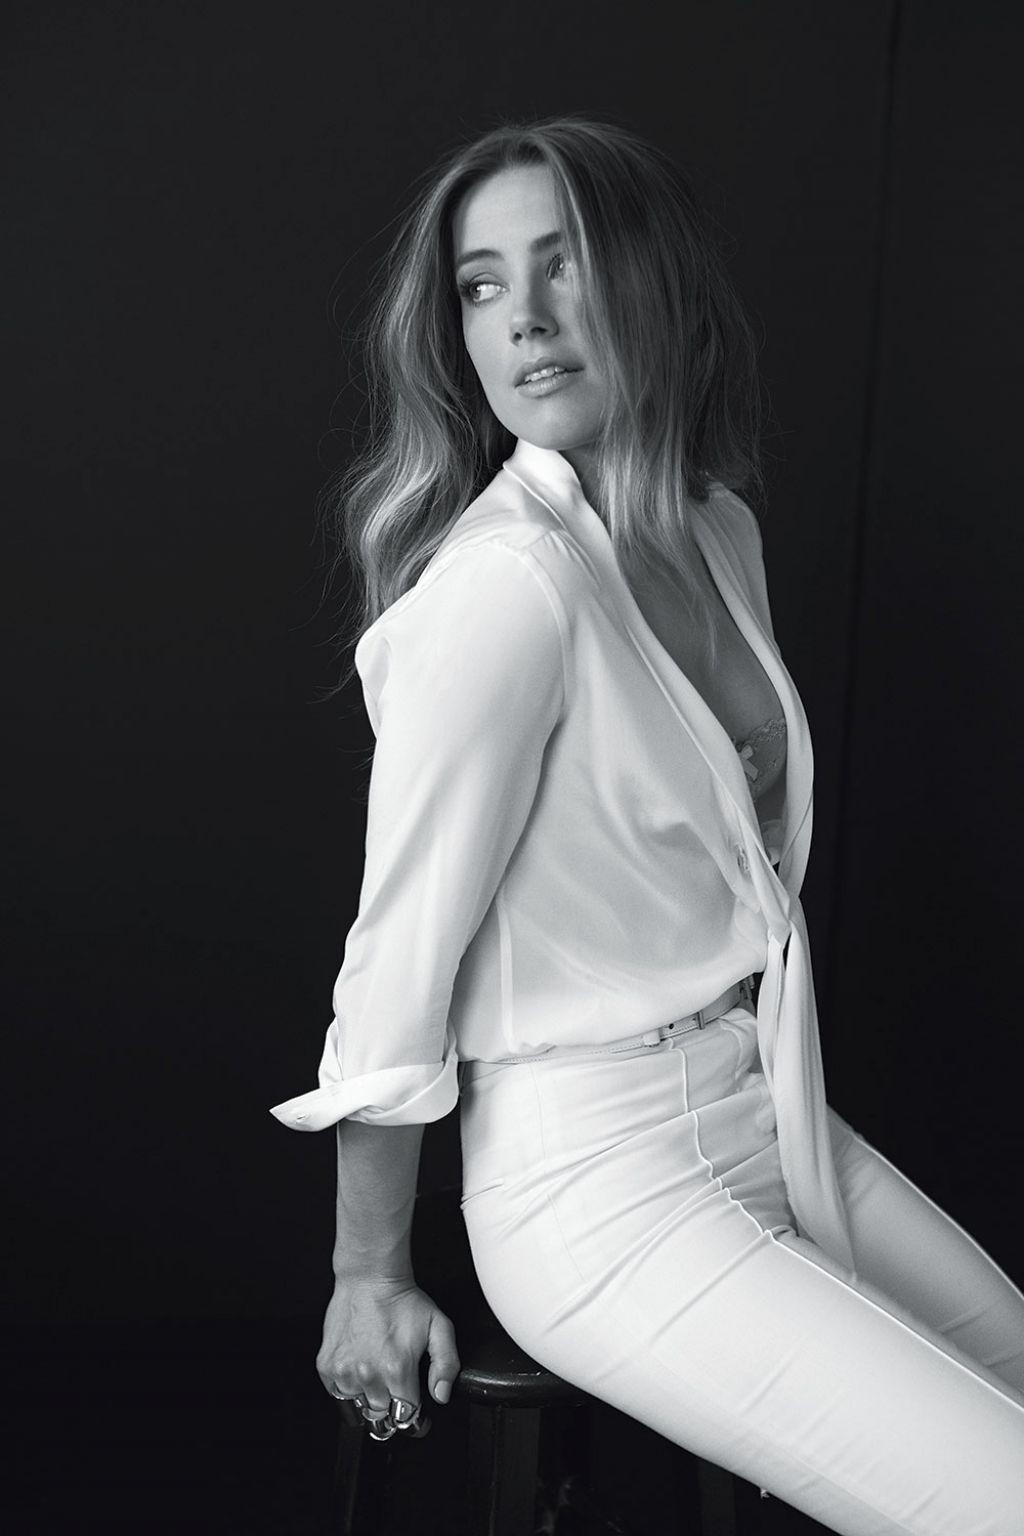 Amber Heard Photoshoot For Flare Magazine